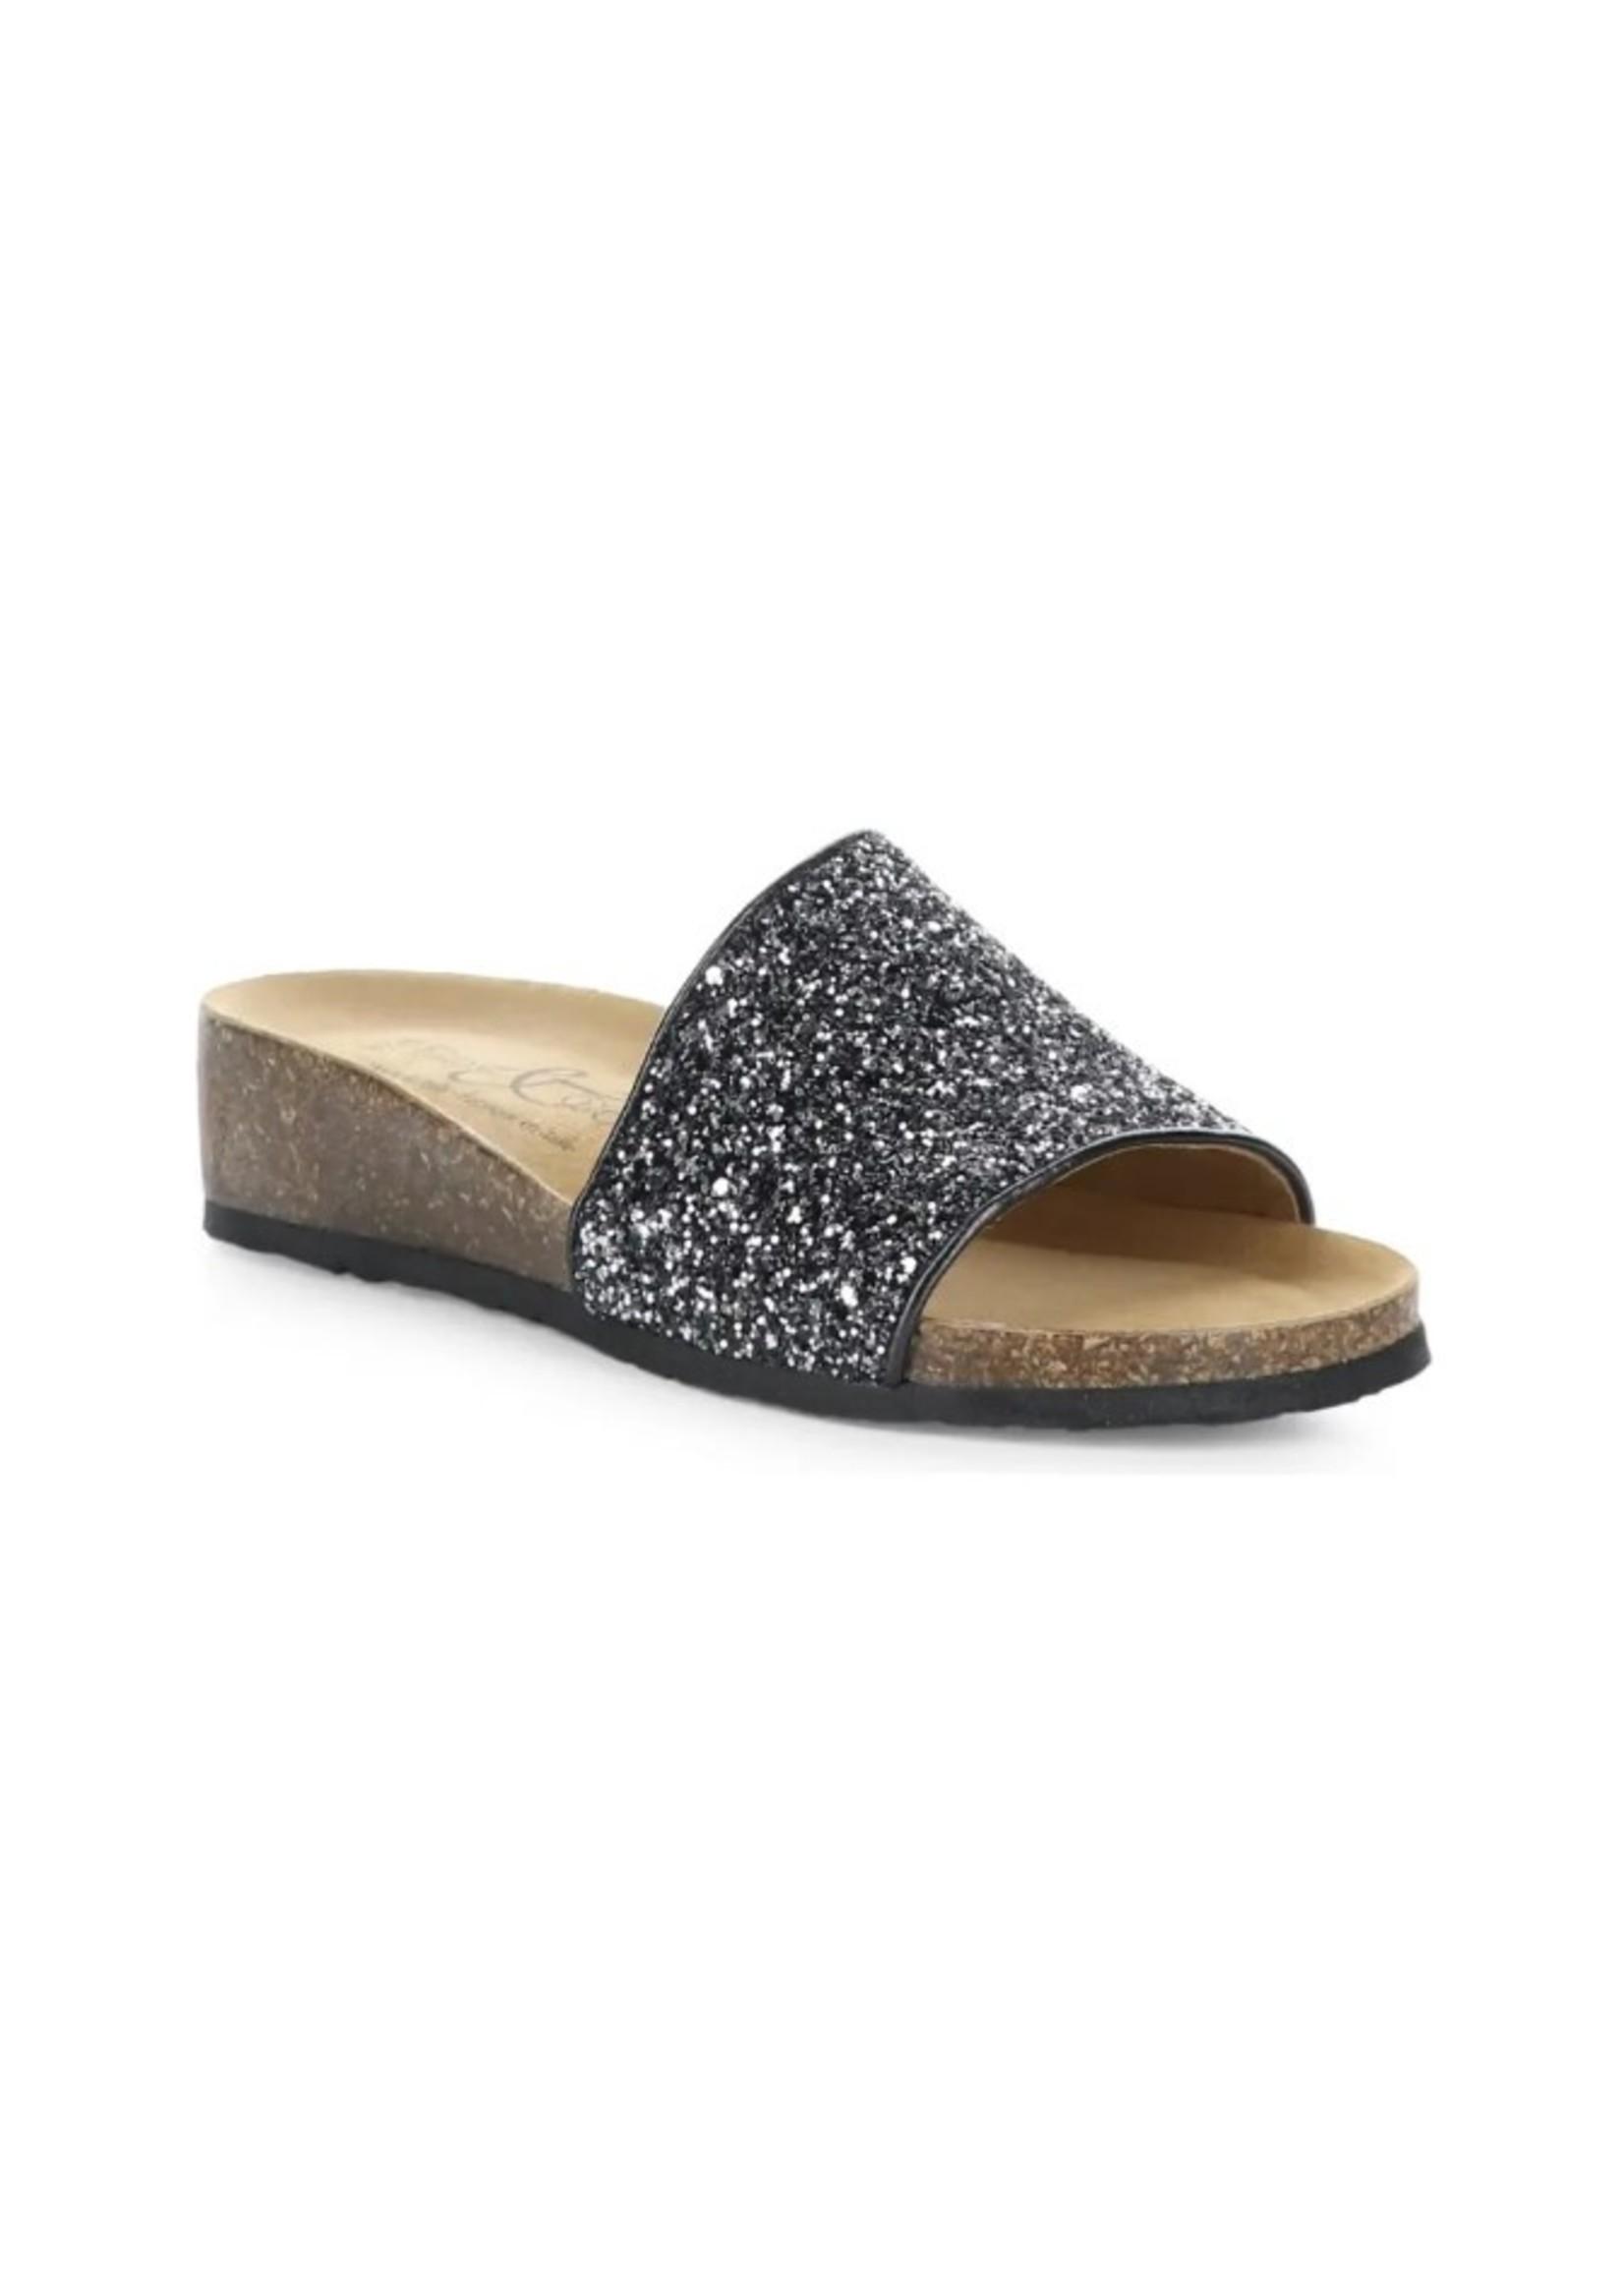 Glux Bling Slide Sandals